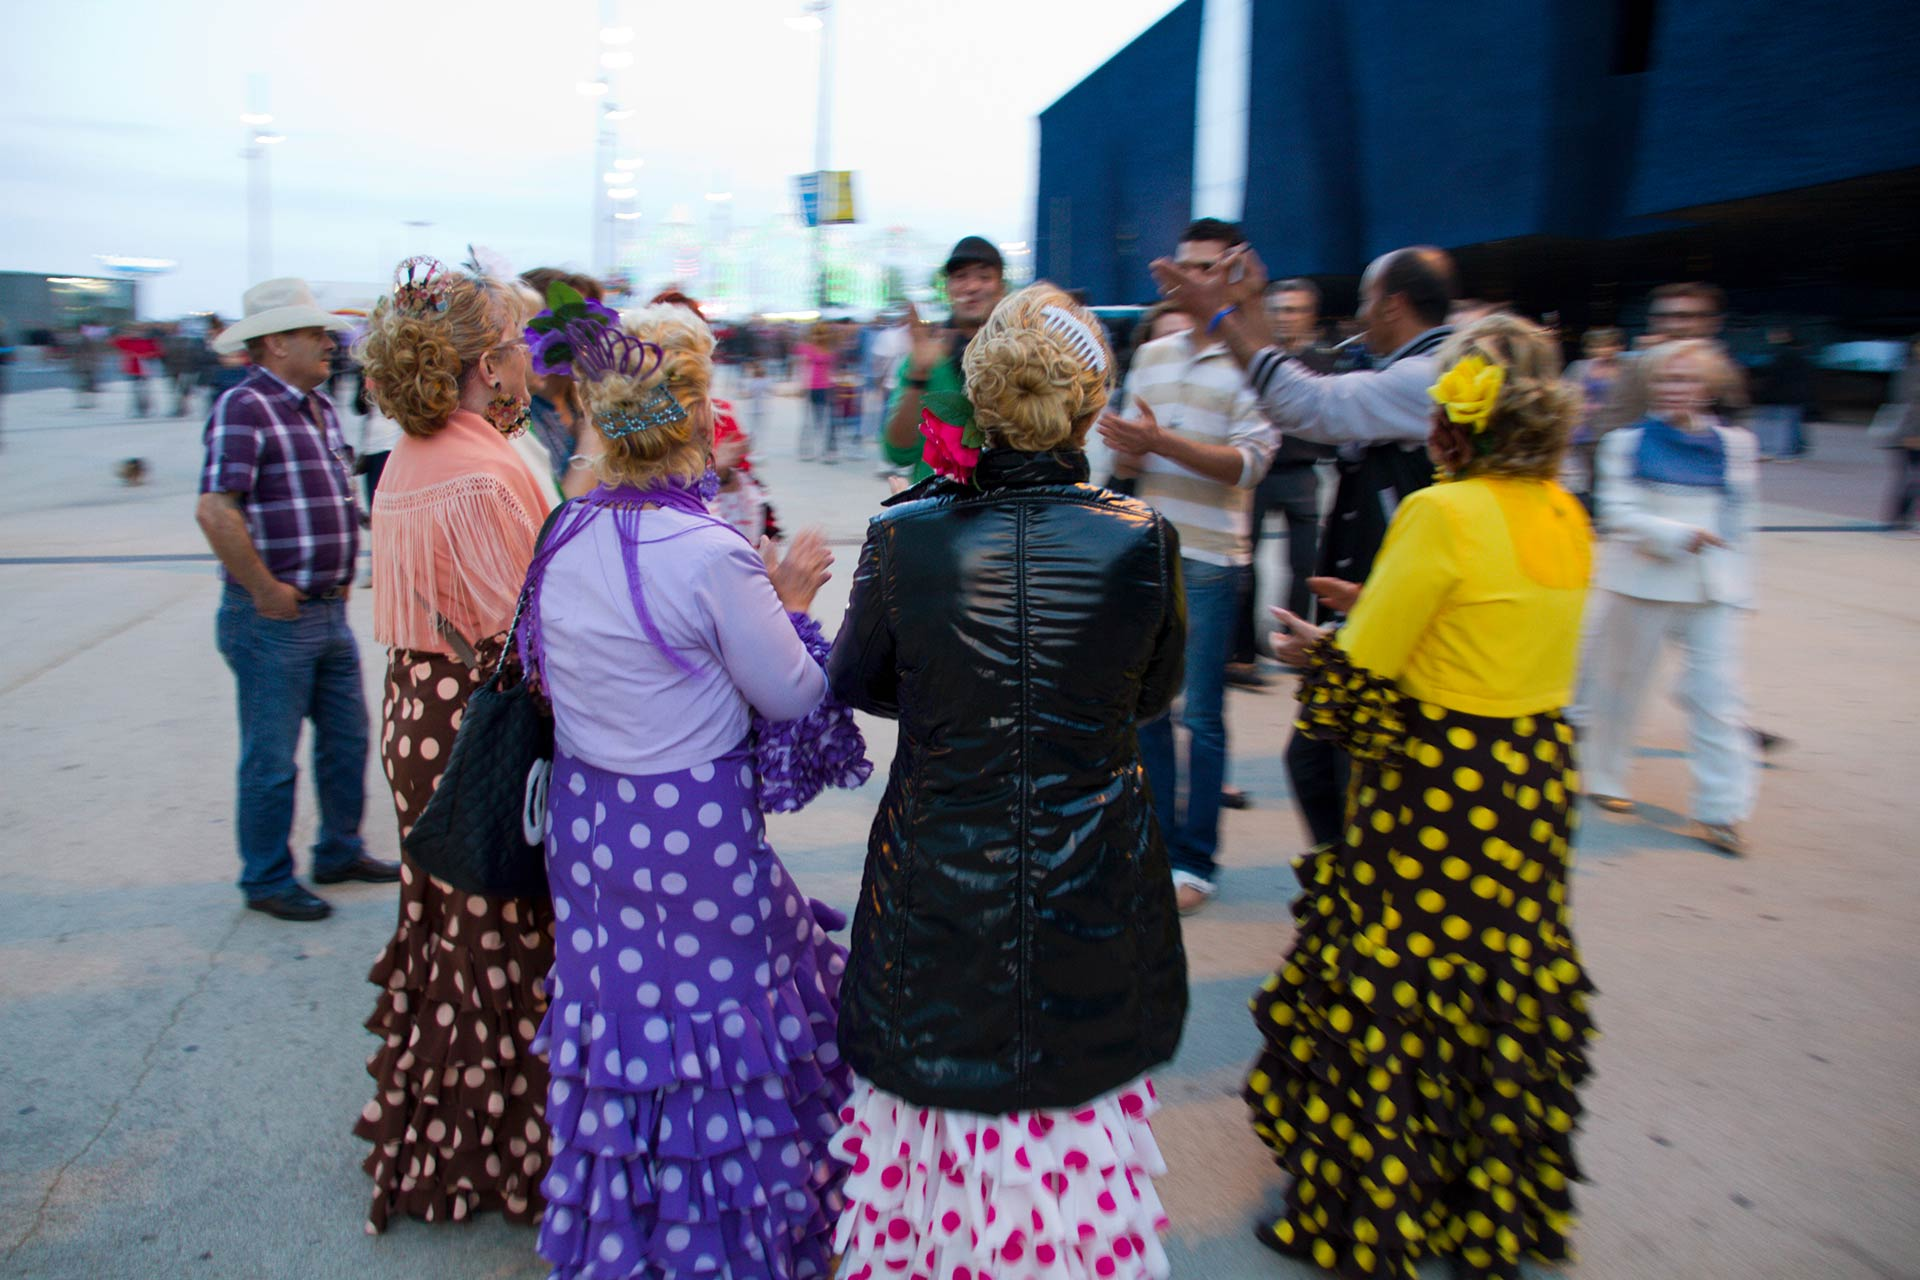 Feria de abril © Tuulia Kolehmainen